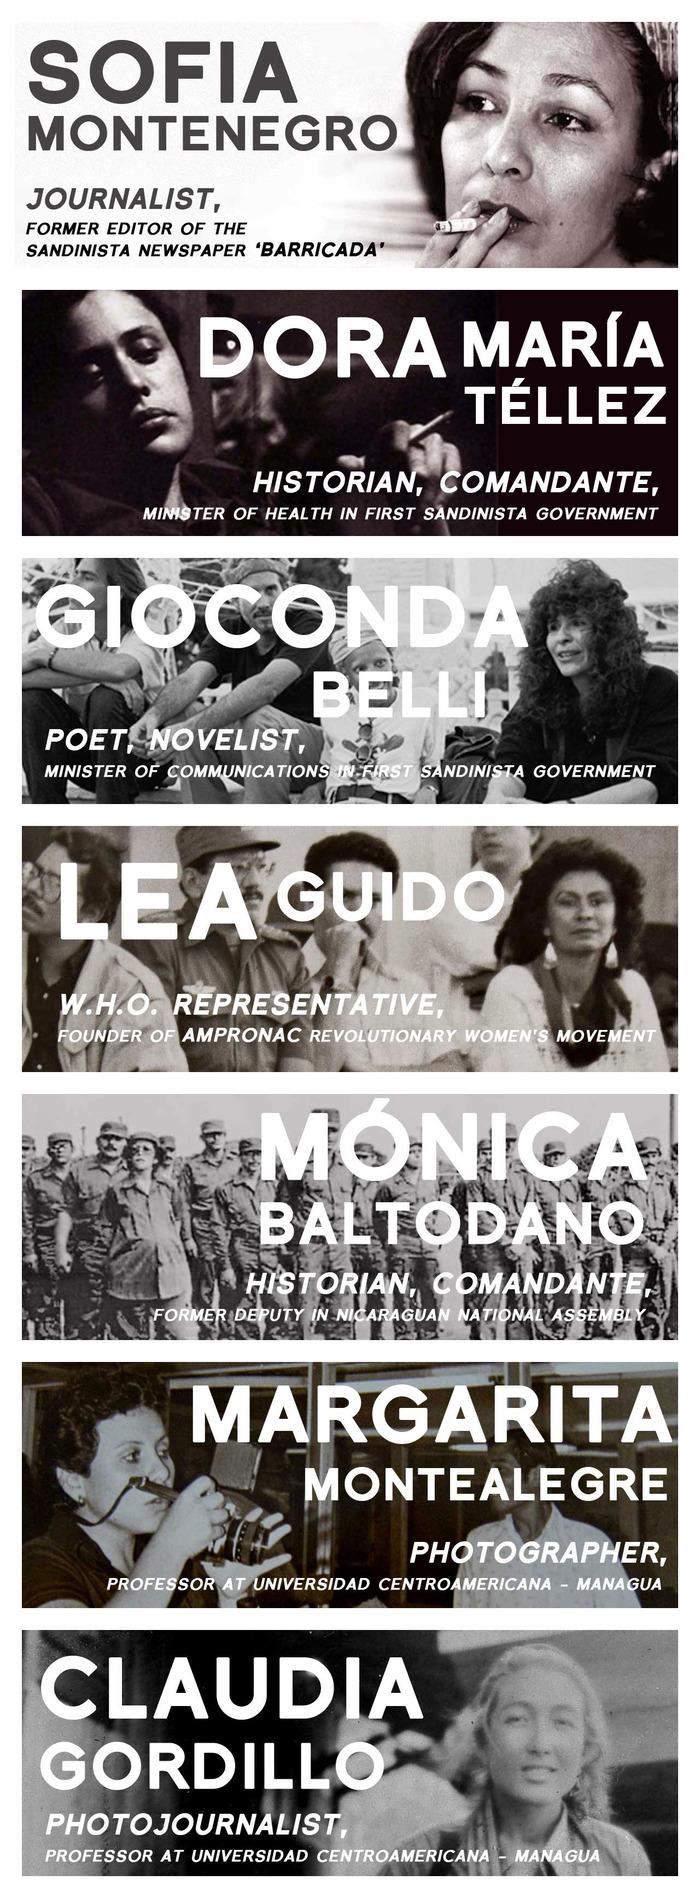 Images of Sofia and Dora María by Margaret Randall, Margarita courtesy of Margarita I. Montealegre, Claudia courtesy of Claudia Gordillo